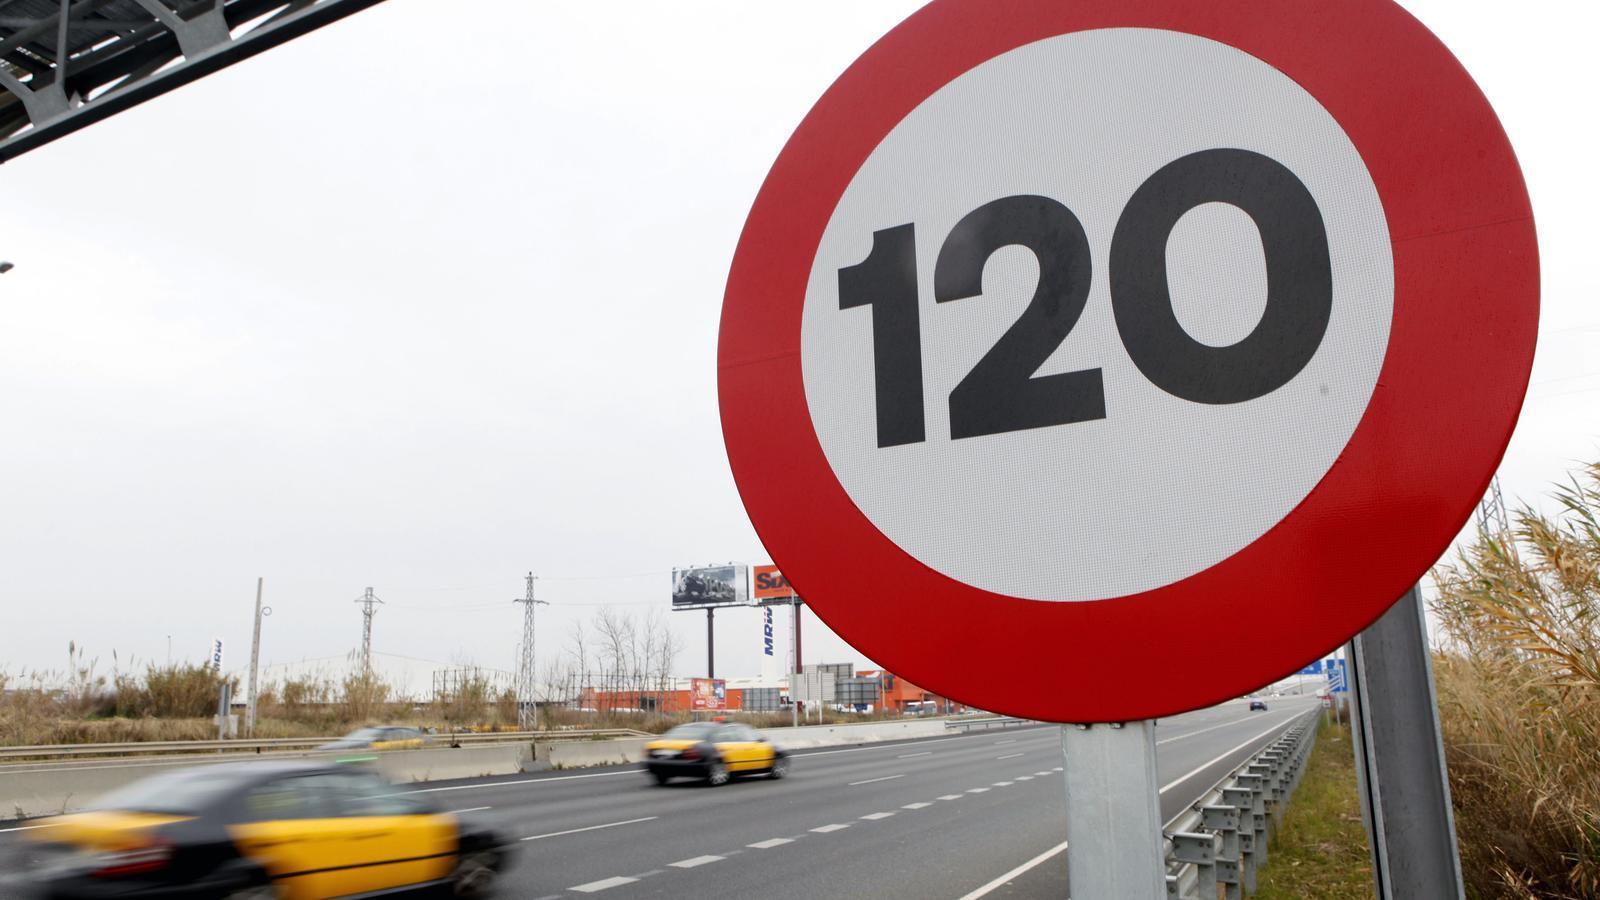 Weg sparen hübsch und bunt sehr bequem L'Estat rebaixa ara a 110 km/h la velocitat